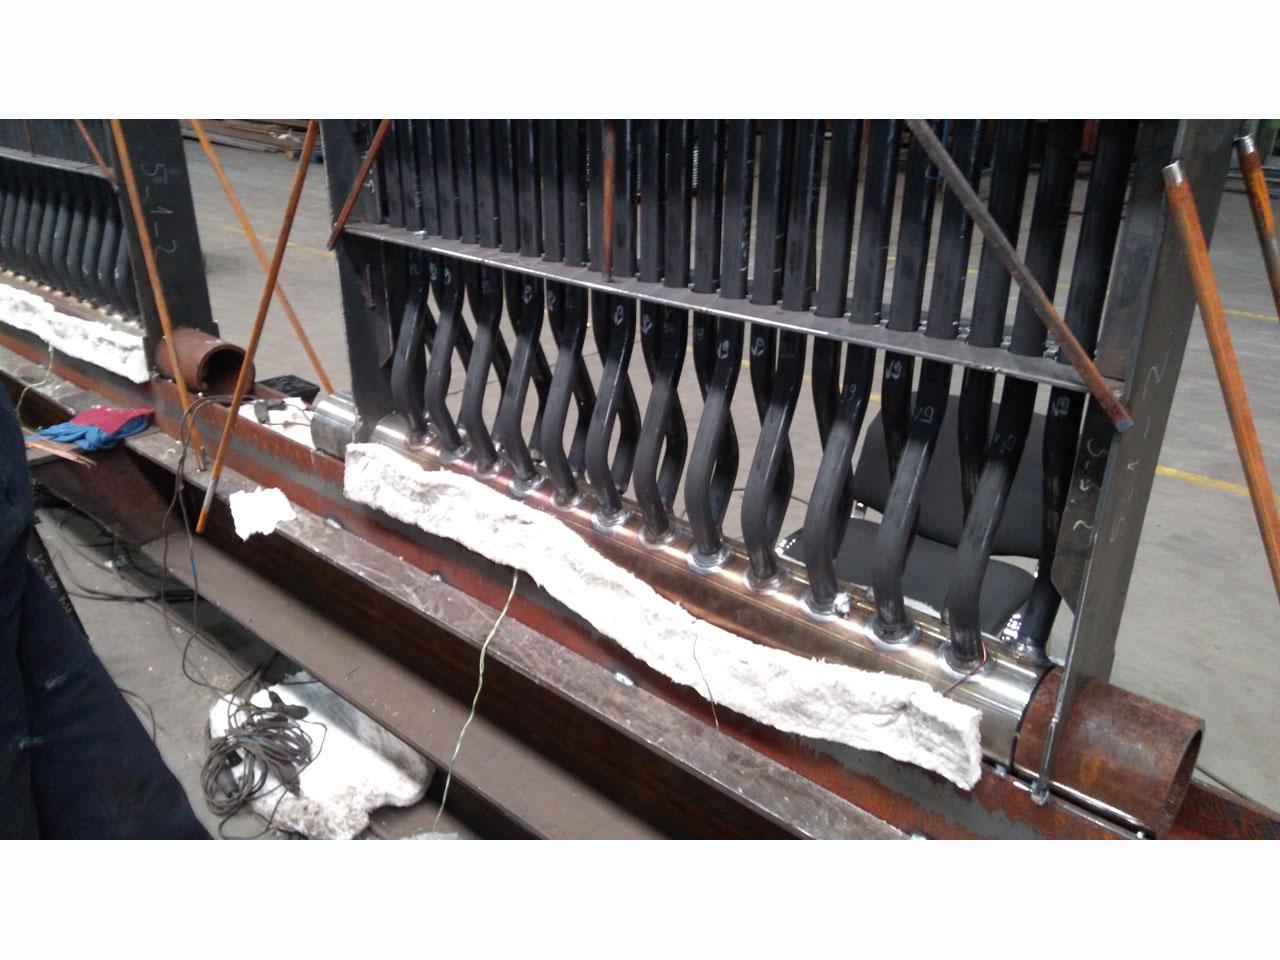 BUGI MONTAŽA Metaloprerada, obrada metala Obrenovac